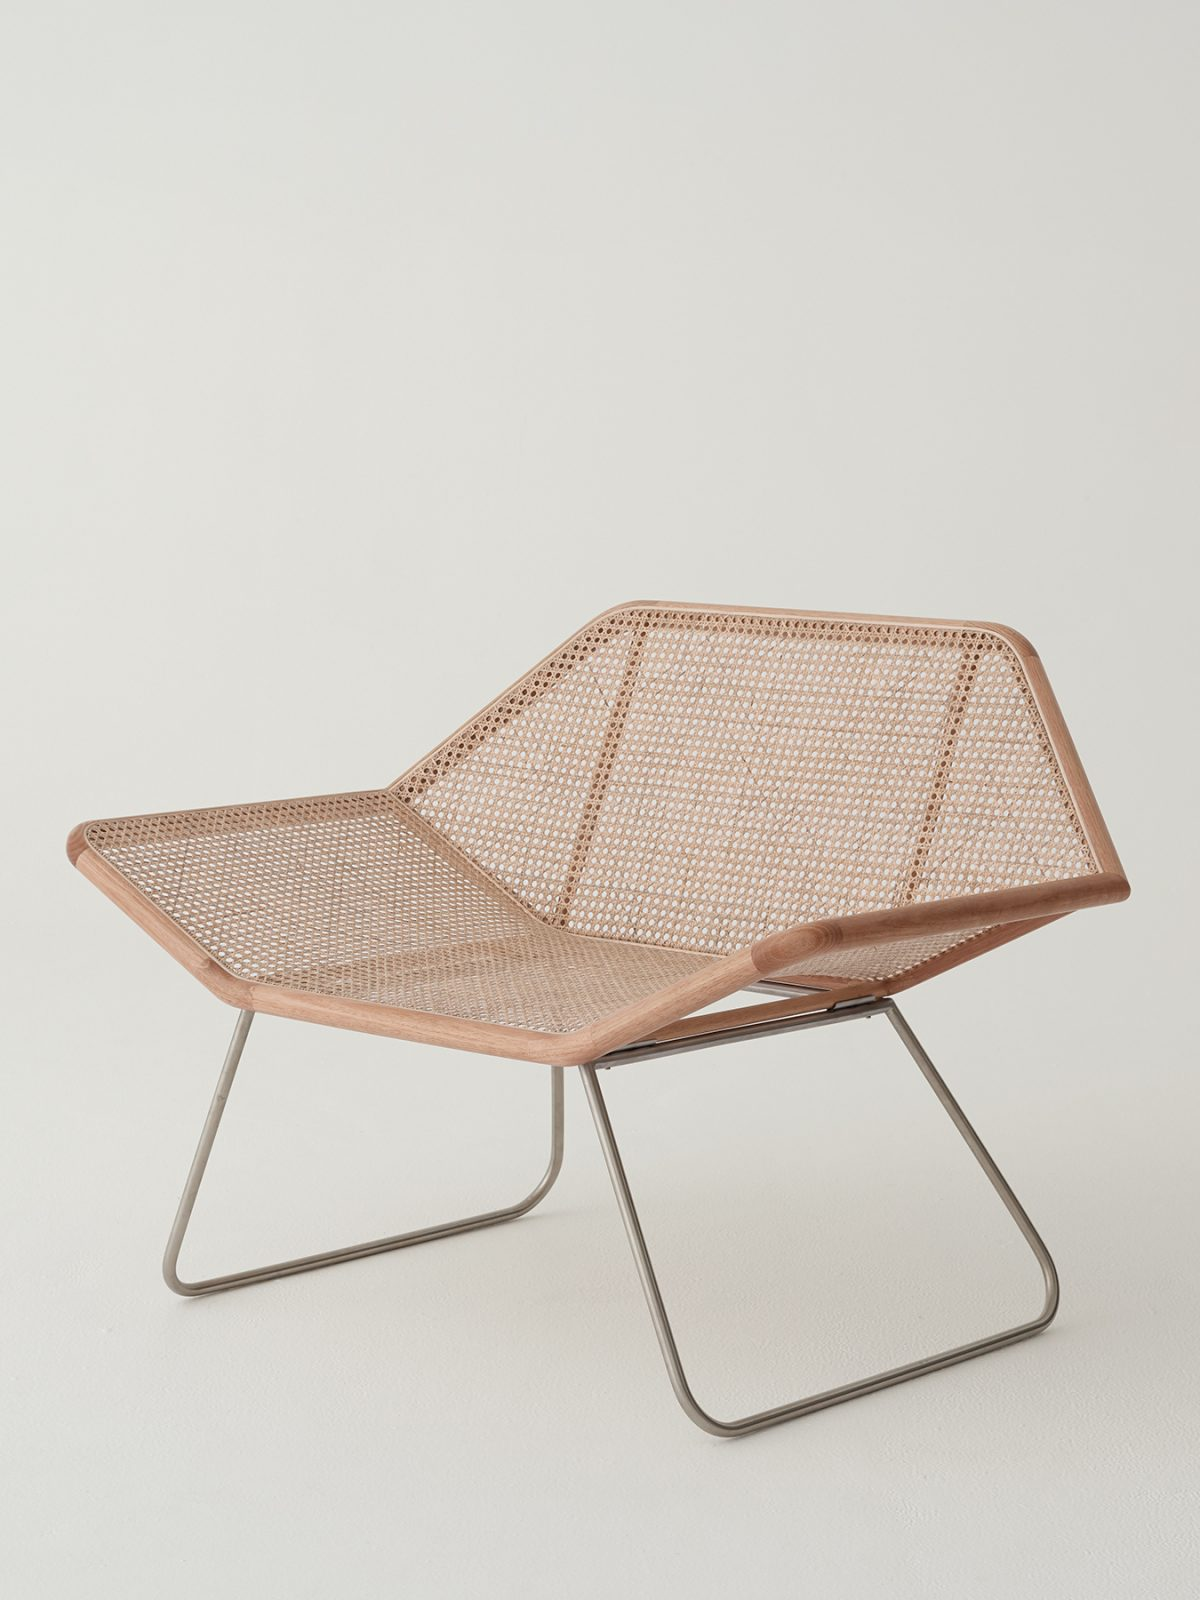 20181207 Dbfurniture Kelly Chair 2